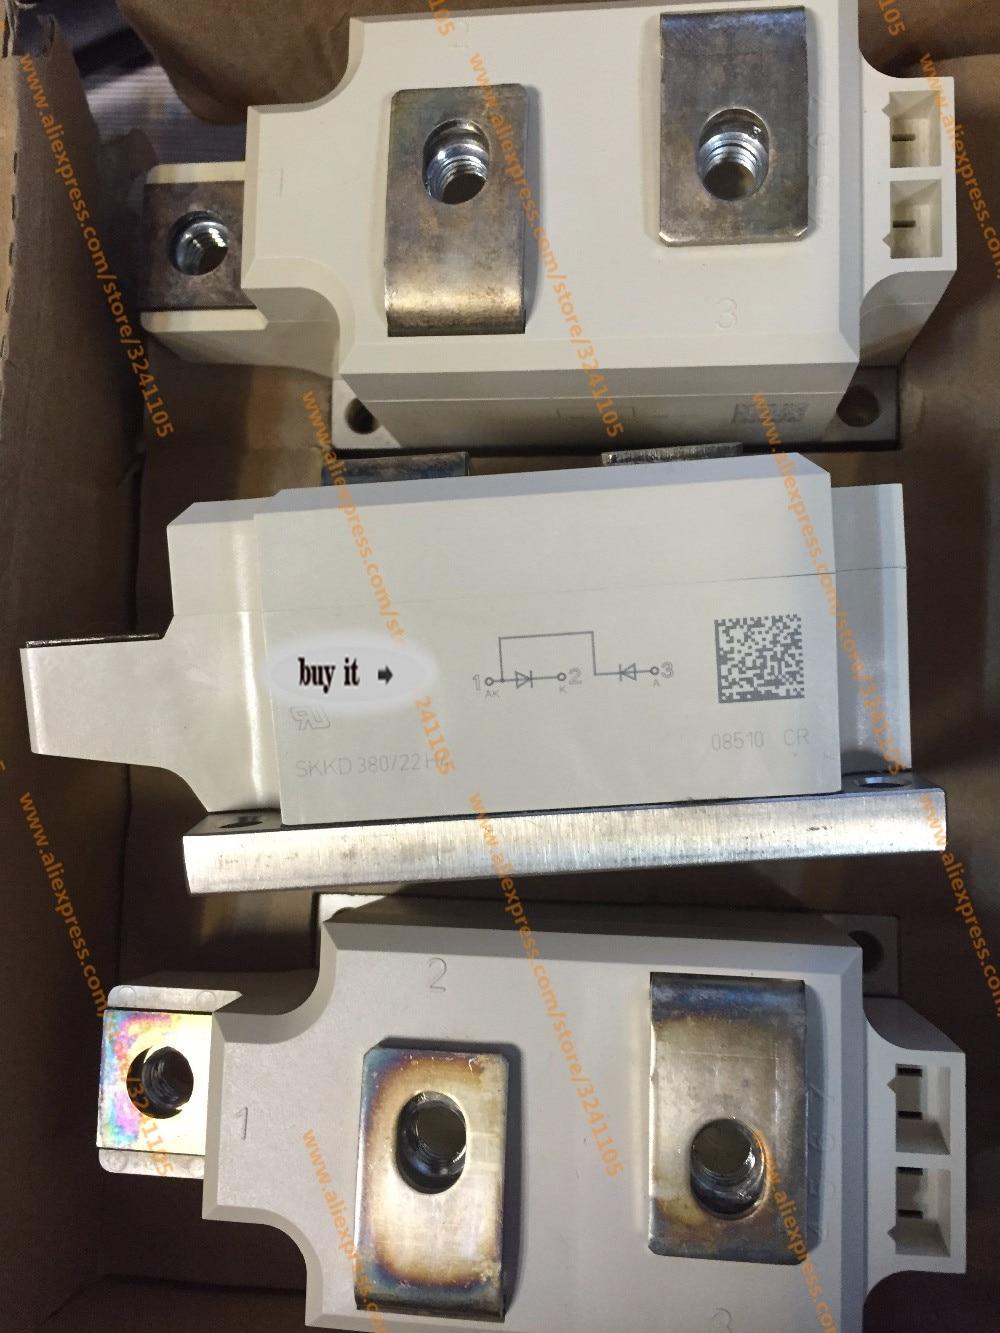 Free Shipping NEW SKKD380/22H4 MODULE